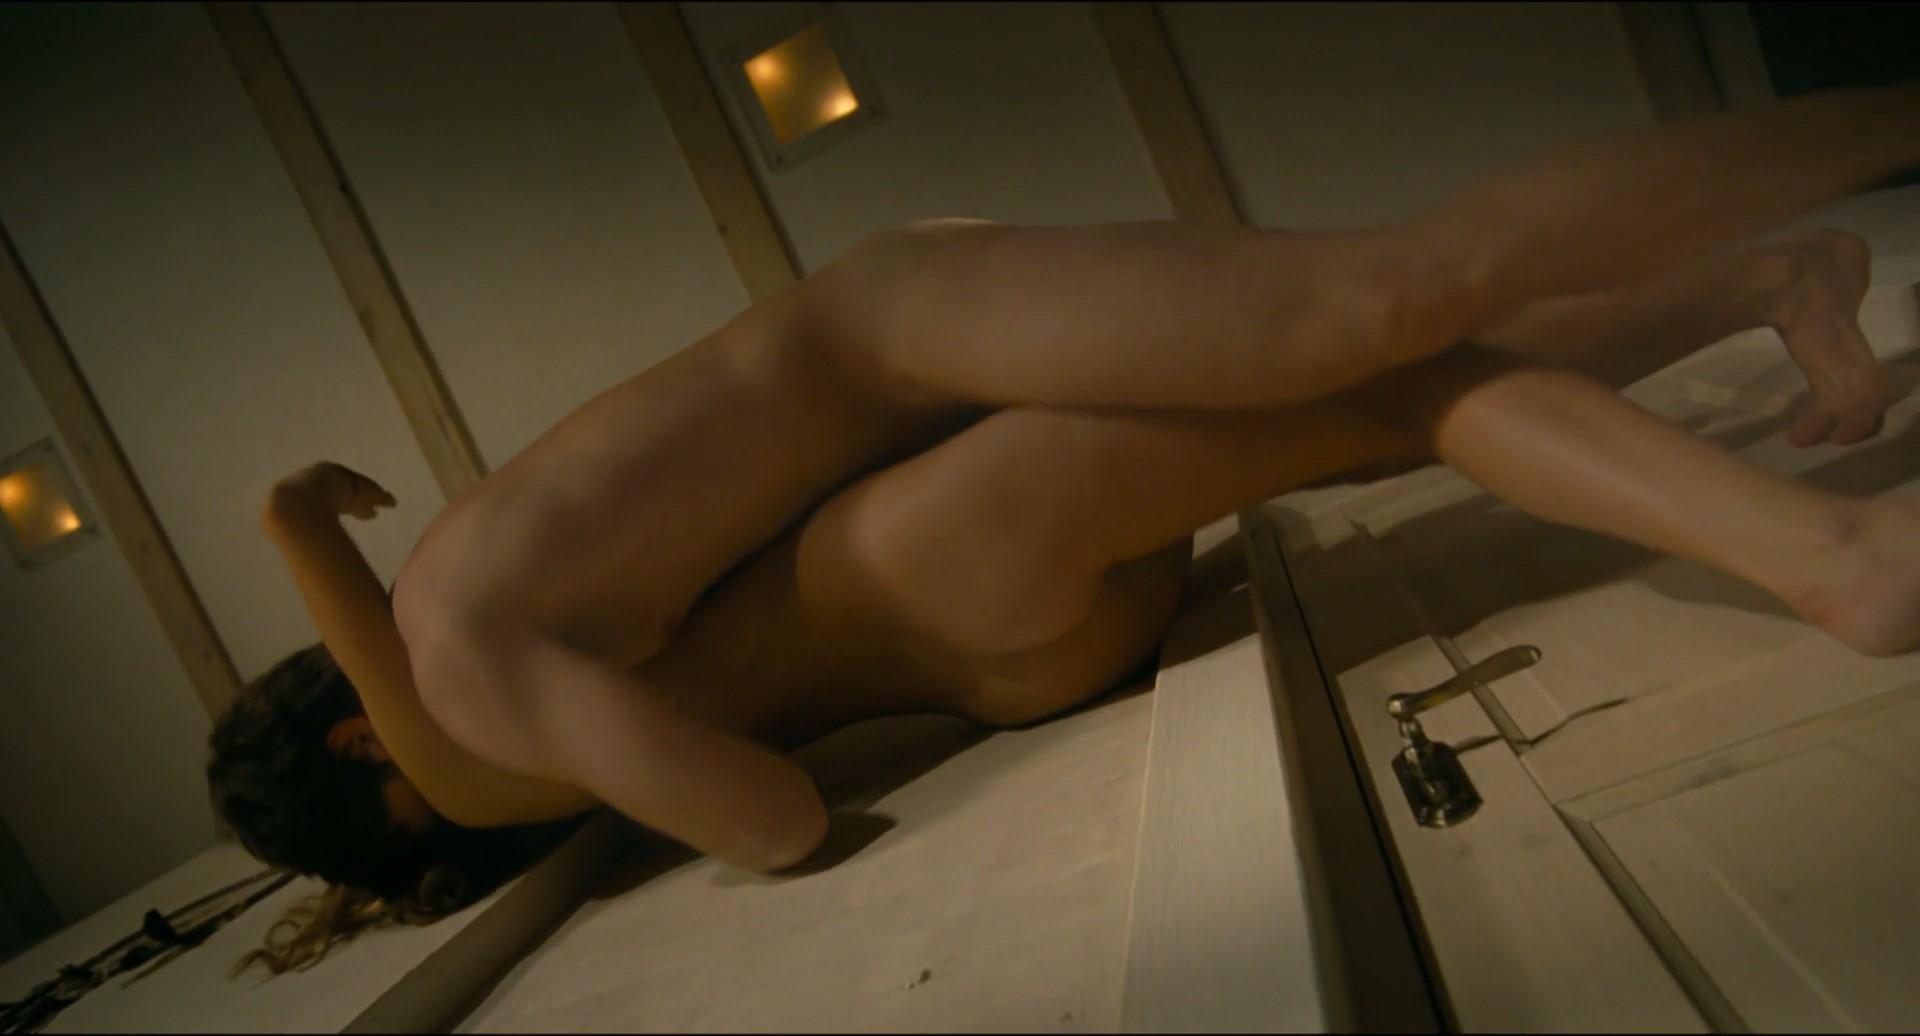 Carolina Guerra Gallows Hill - 2013 HD 720p/1080p nudes (69 image)